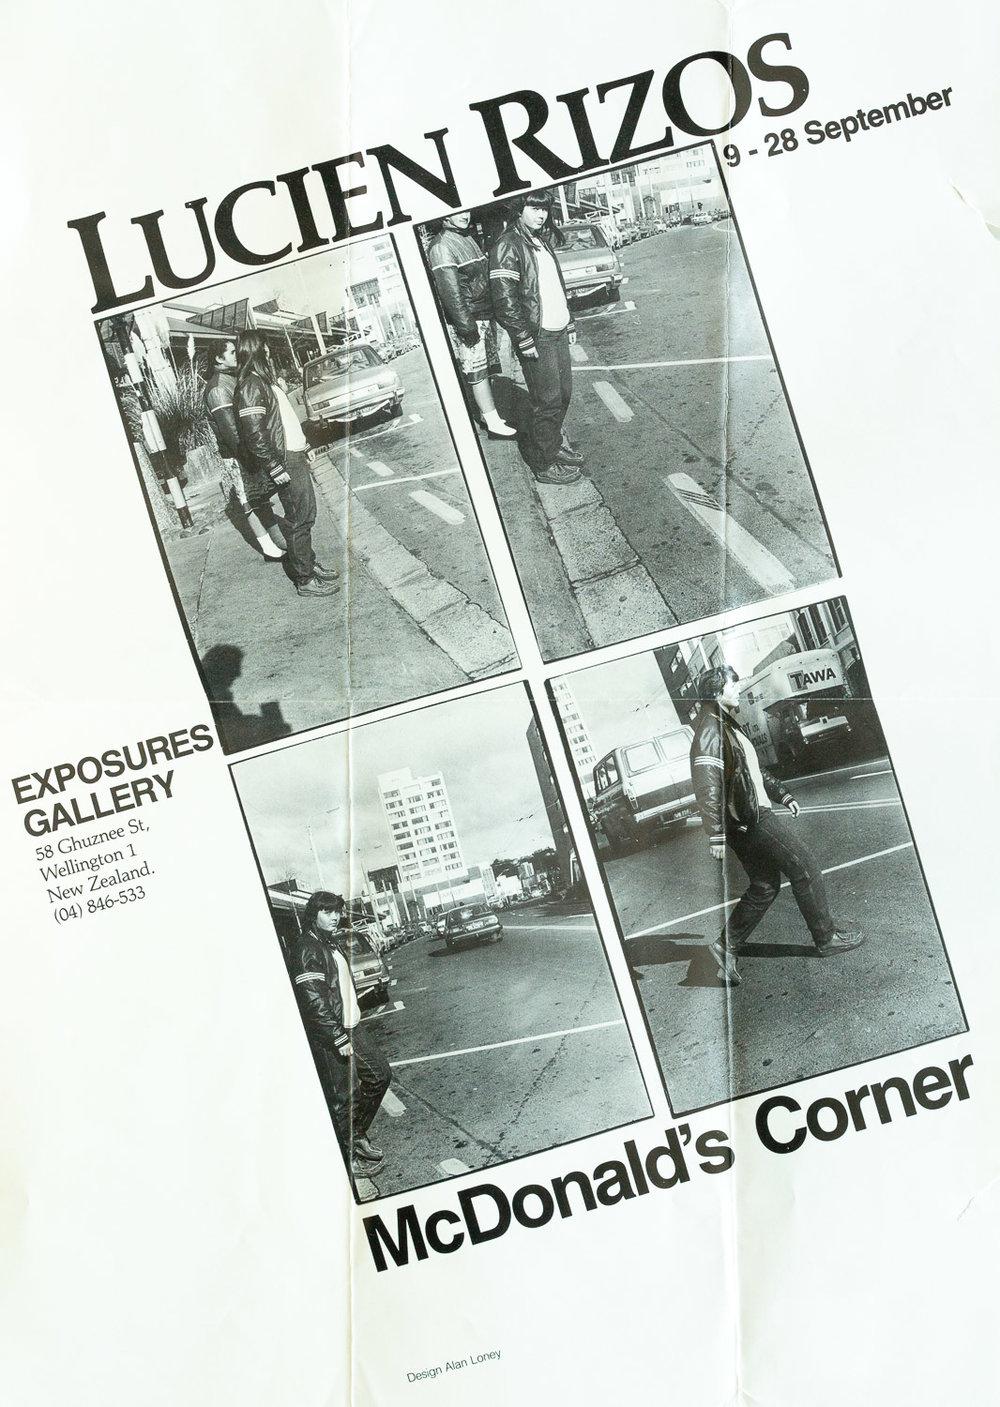 Lucien RizosMcDonald's Corner9 – 28 September, 1985. Design: Alan Loney